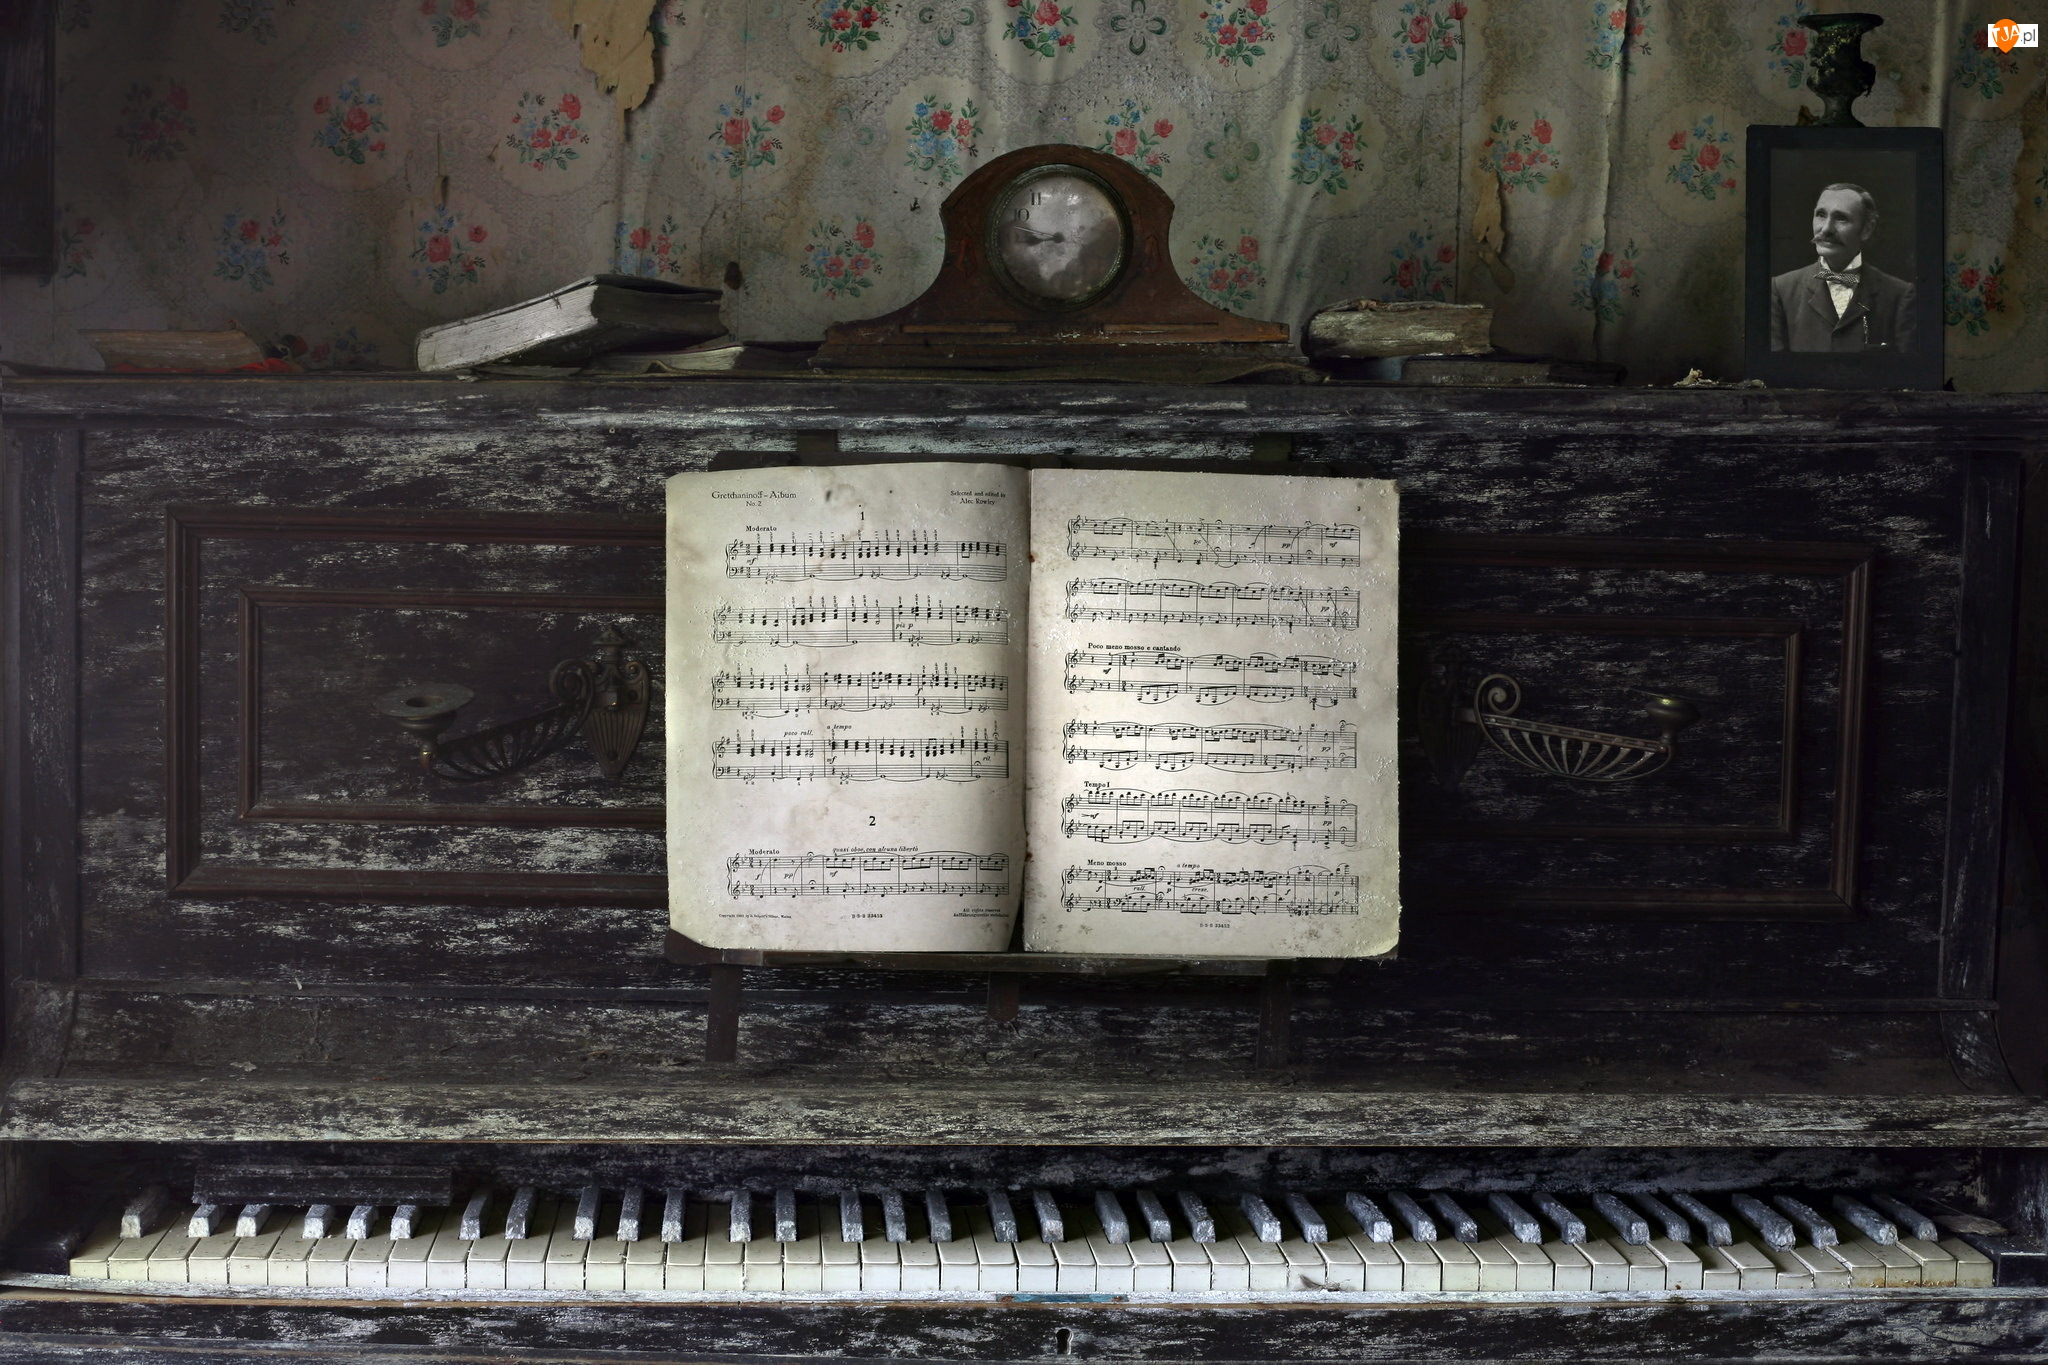 Stare, Zegar, Pianino, Nuty